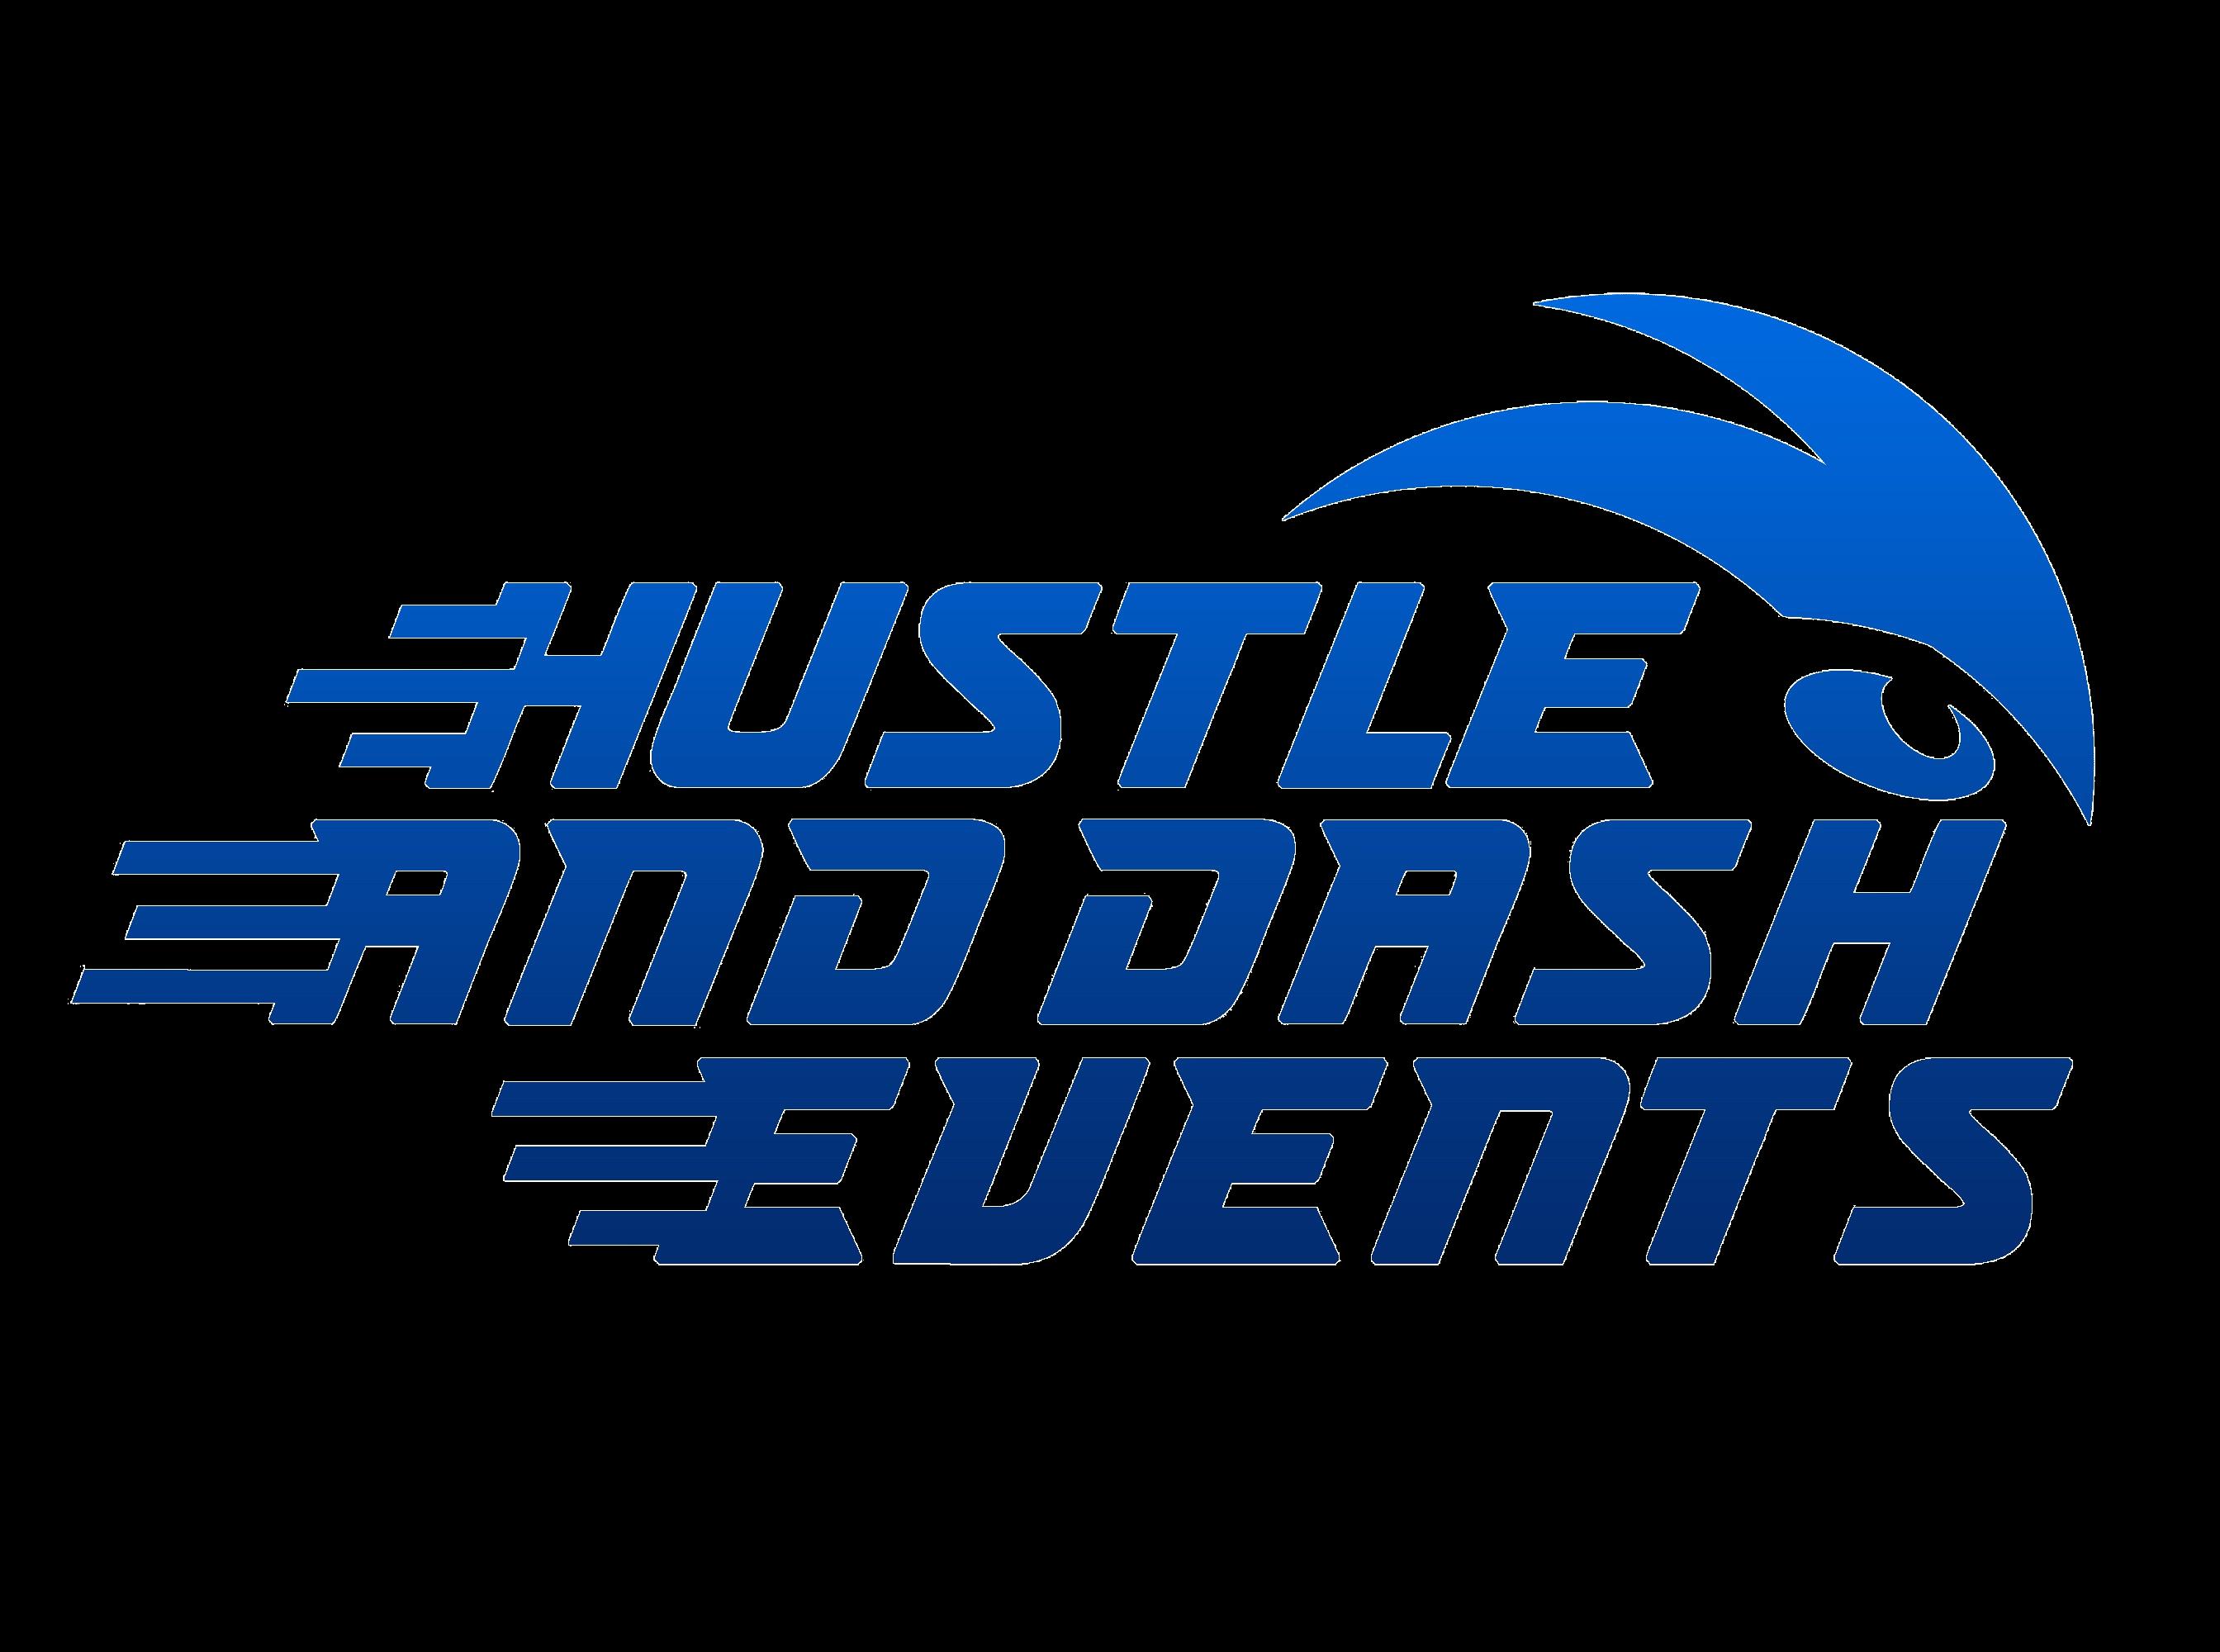 Hustle & Dash